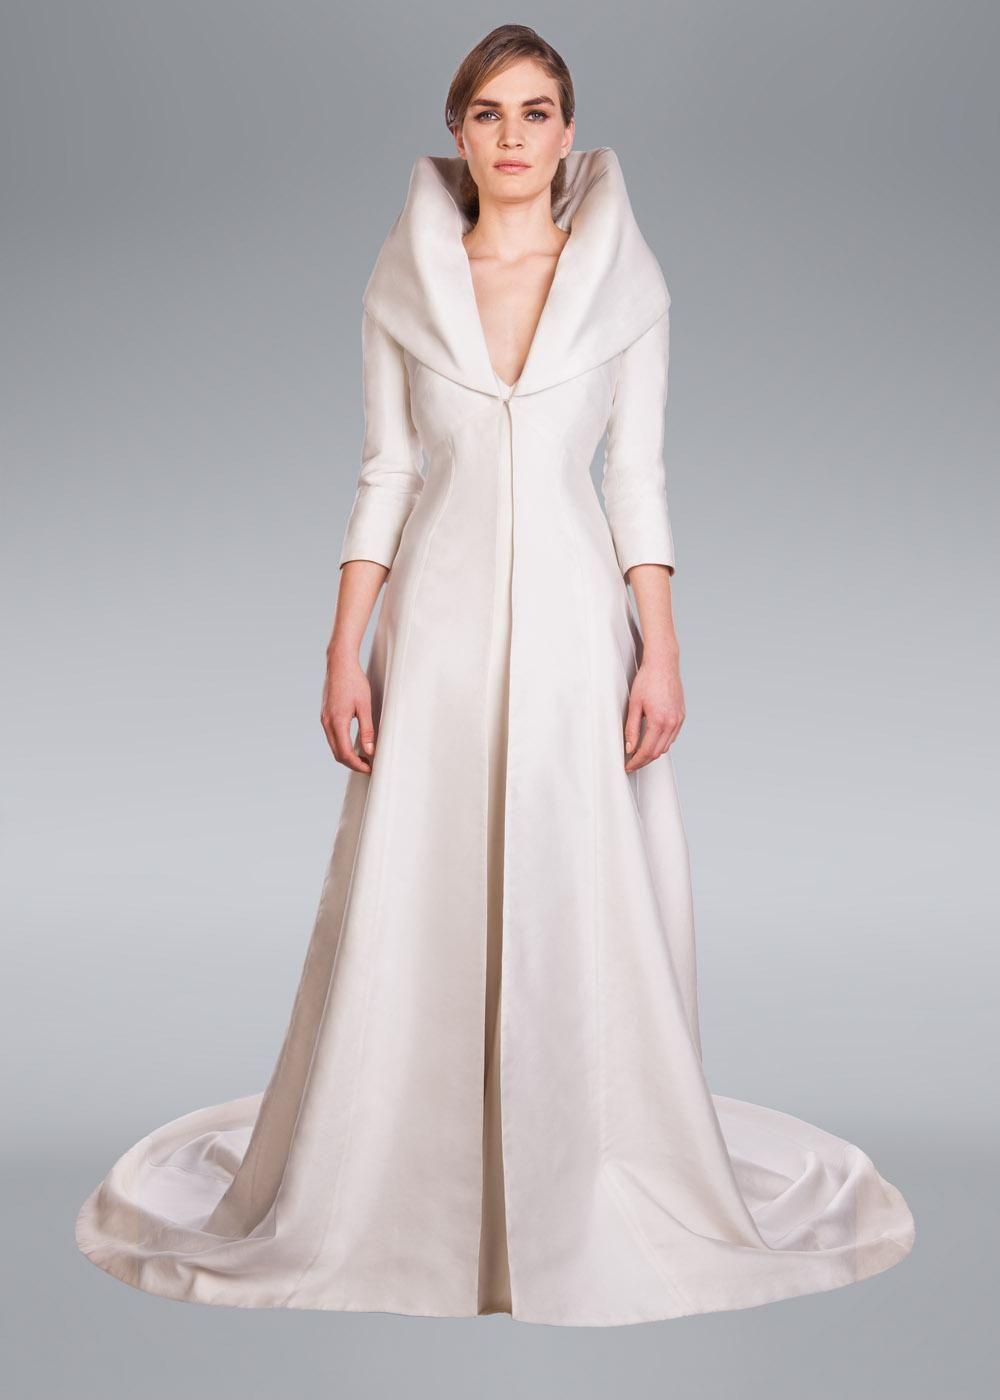 Alberta Wedding Coat, Amanda Wakeley Designer Clothes | OTT party ...